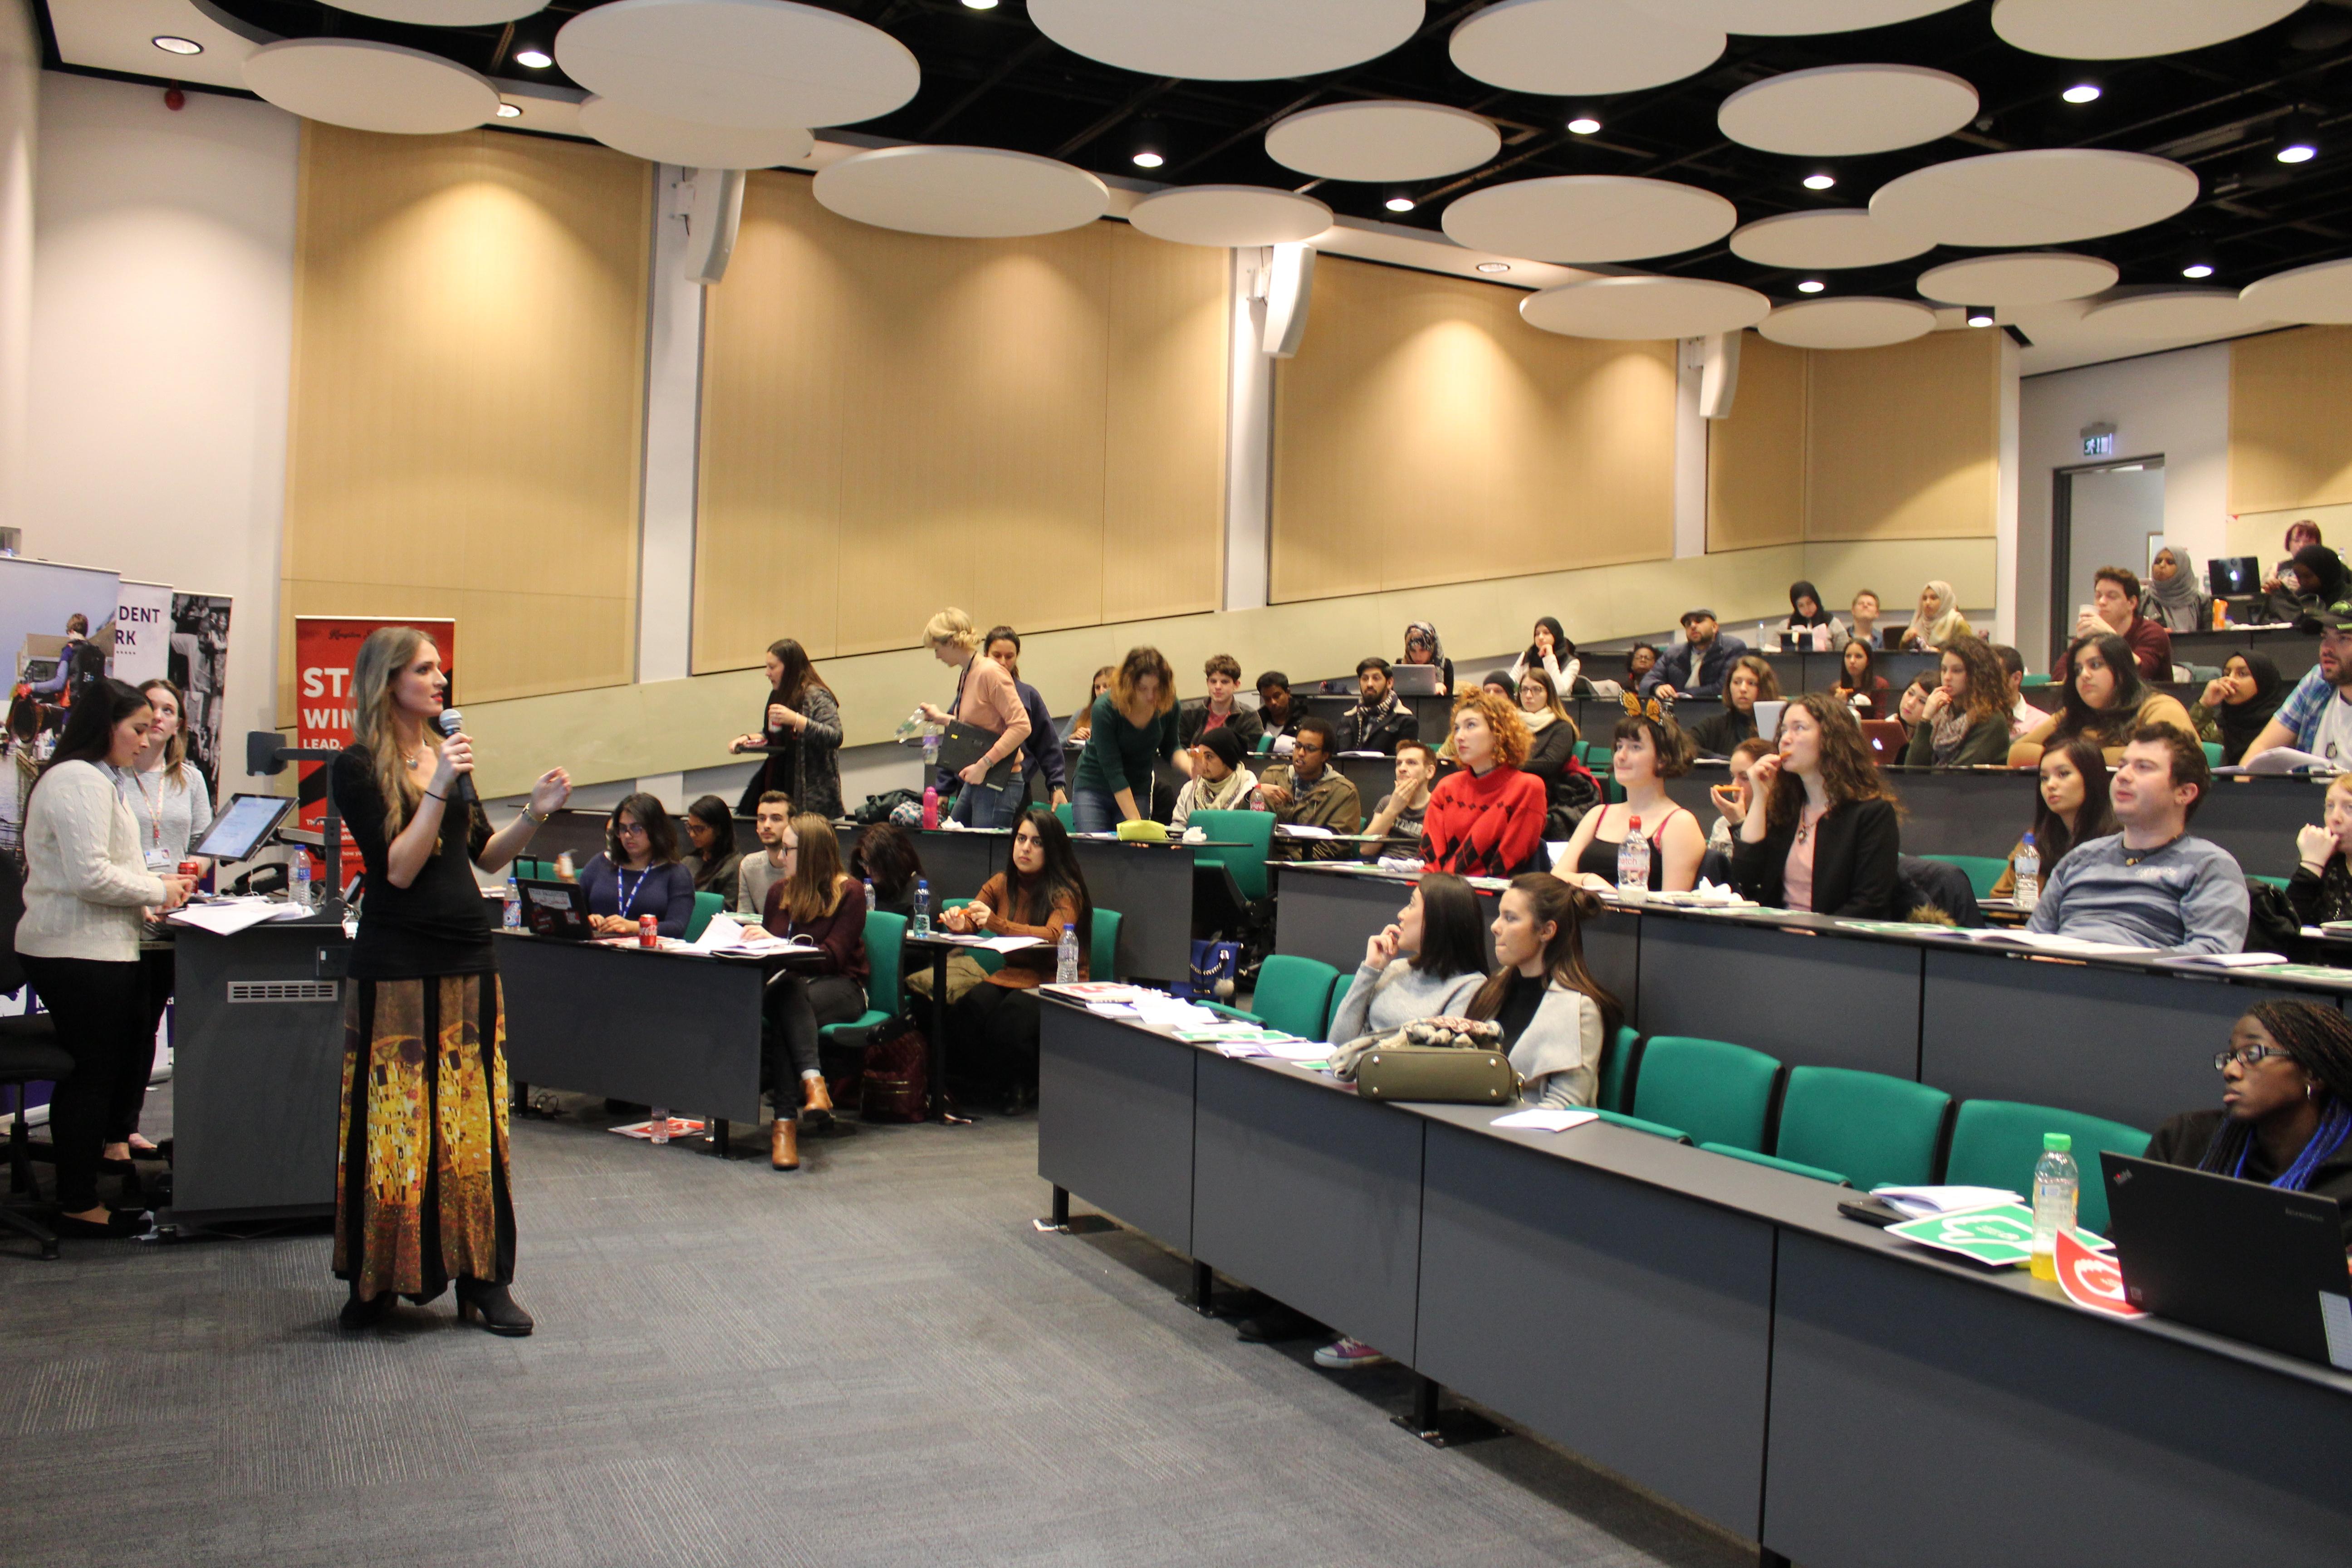 University pleads with students to fill in national survey despite union boycott bid